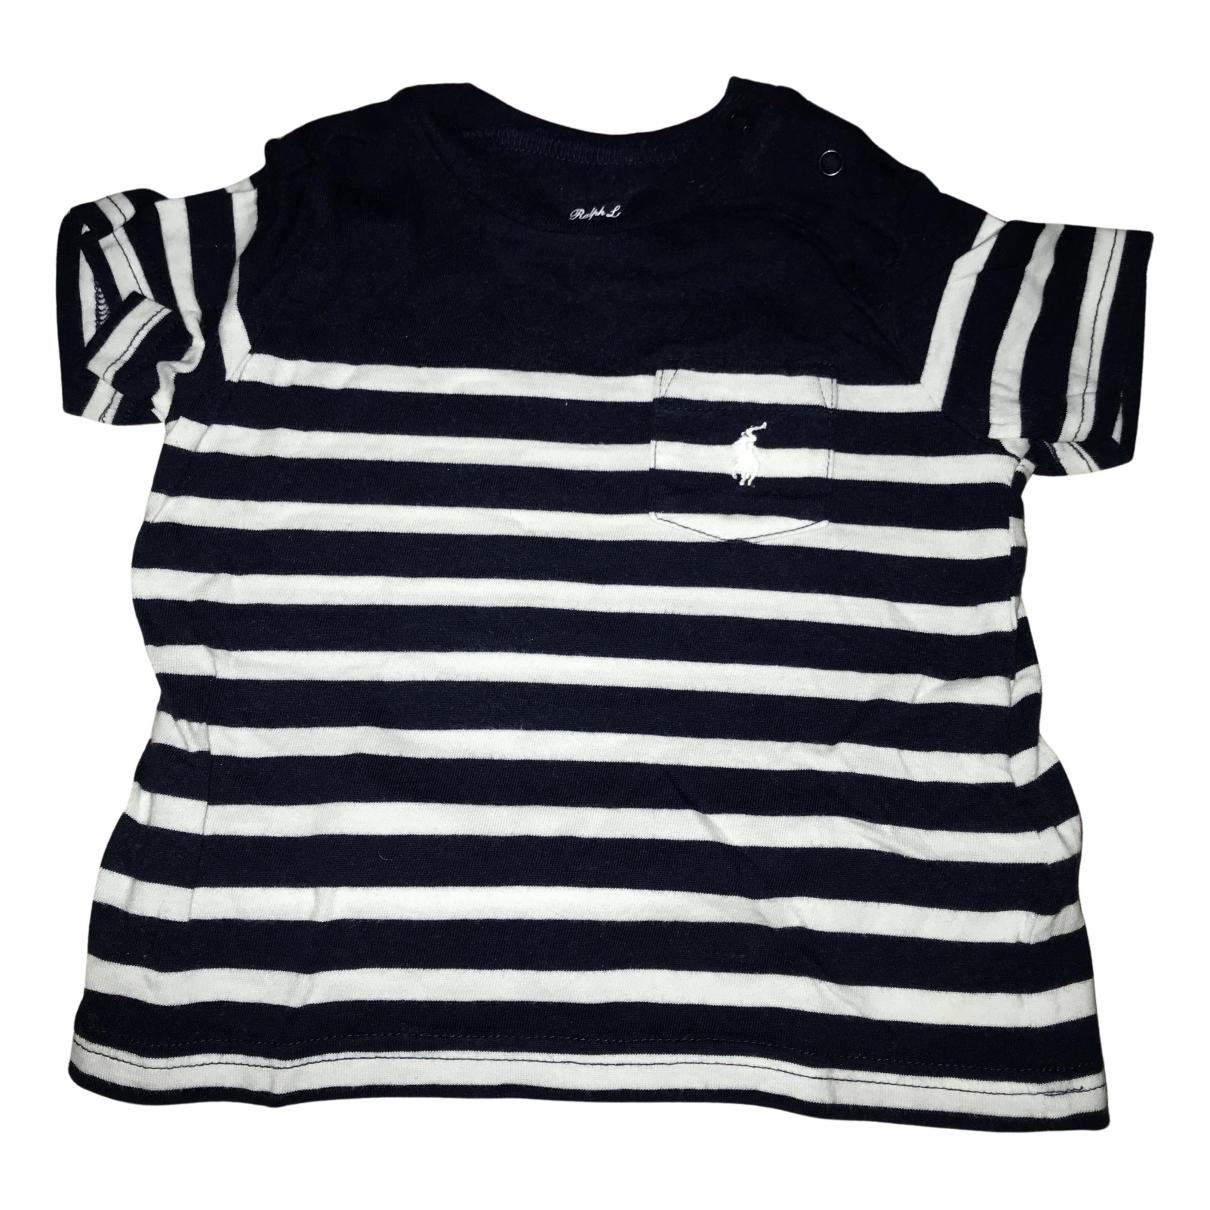 Ralph Lauren N Blue Cotton  top for Kids 6 months - up to 67cm FR